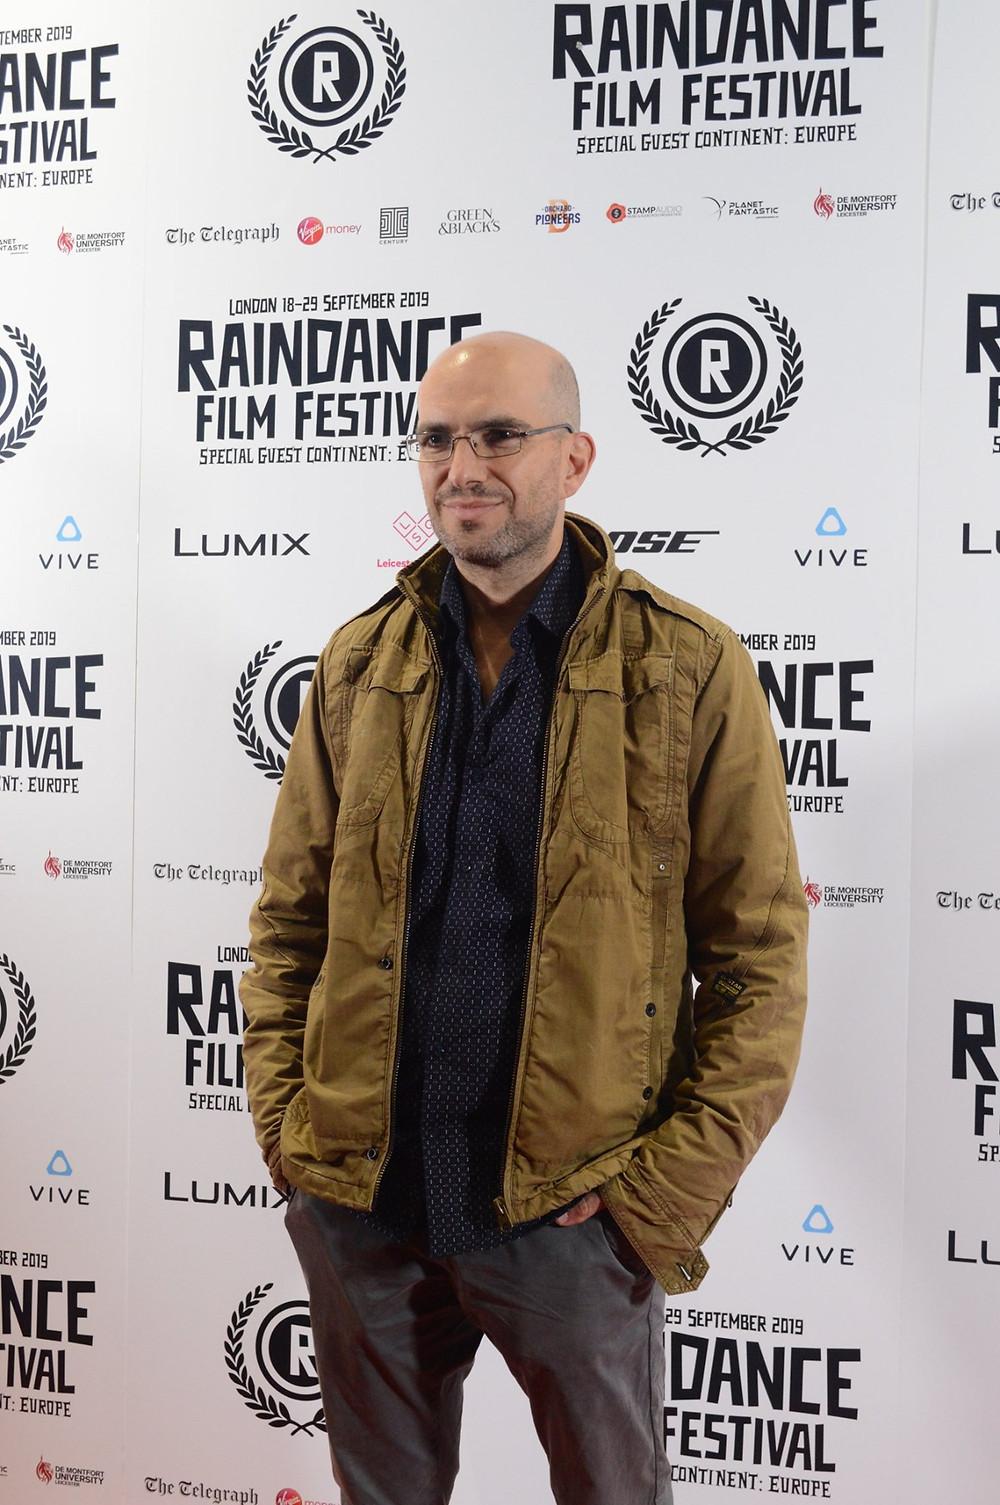 director Lukas Agelastos at Raindance